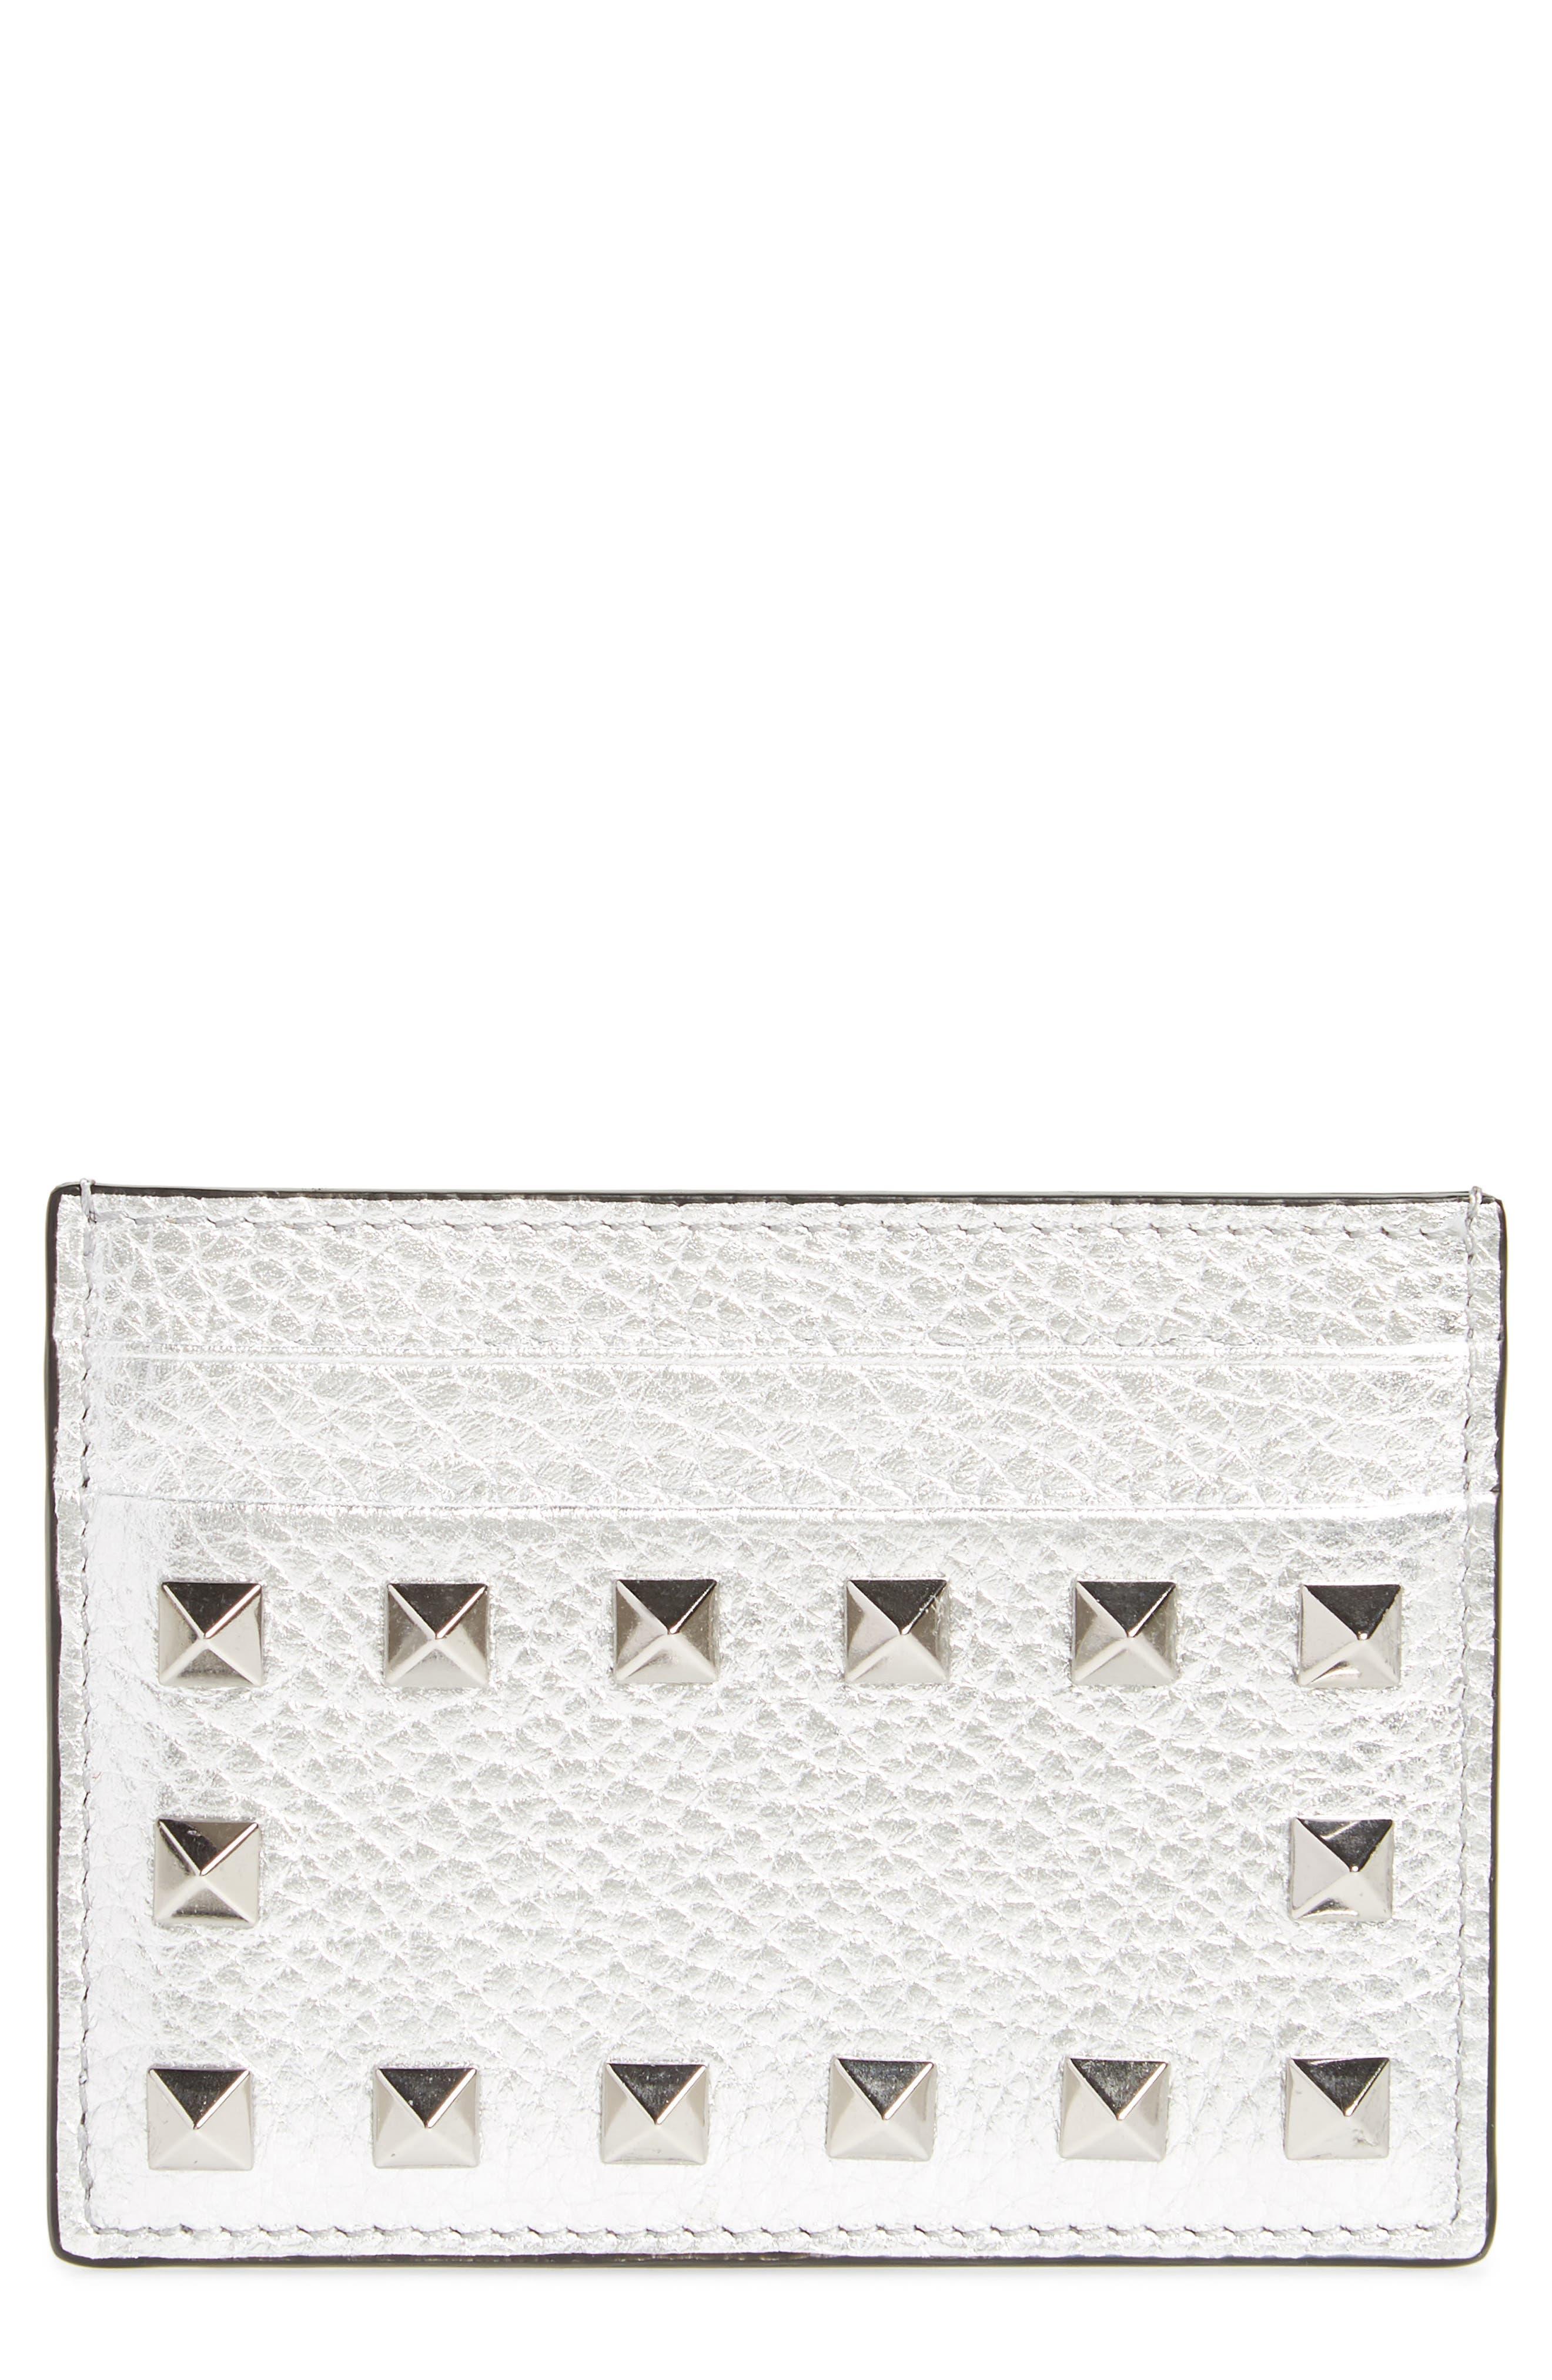 VALENTINO GARAVANI Rockstud Metallic Leather Card Holder